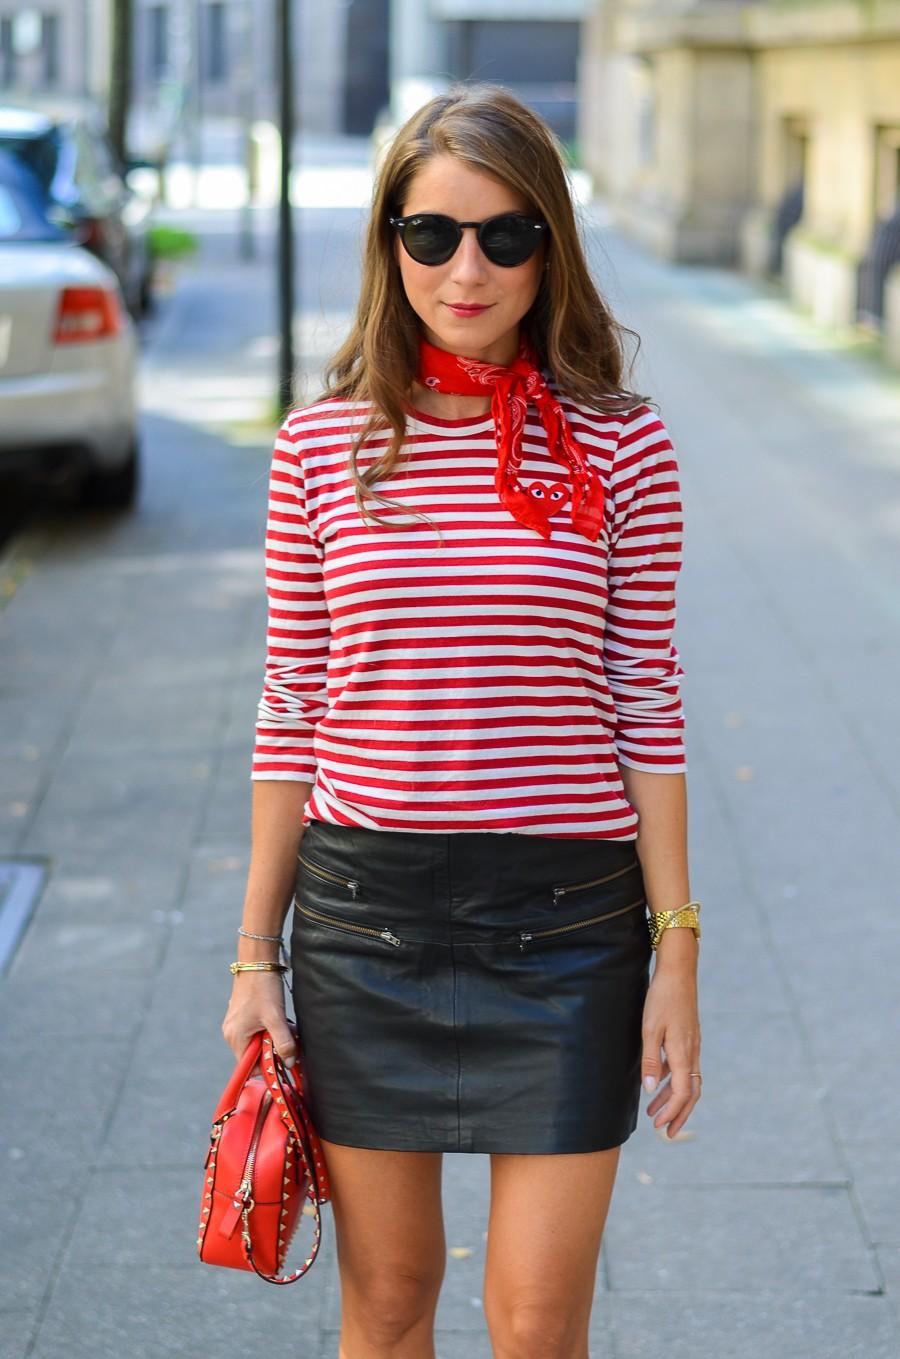 leder mini rock ringelshirt bandana outfit fashion blog rote tasche sonnebrille